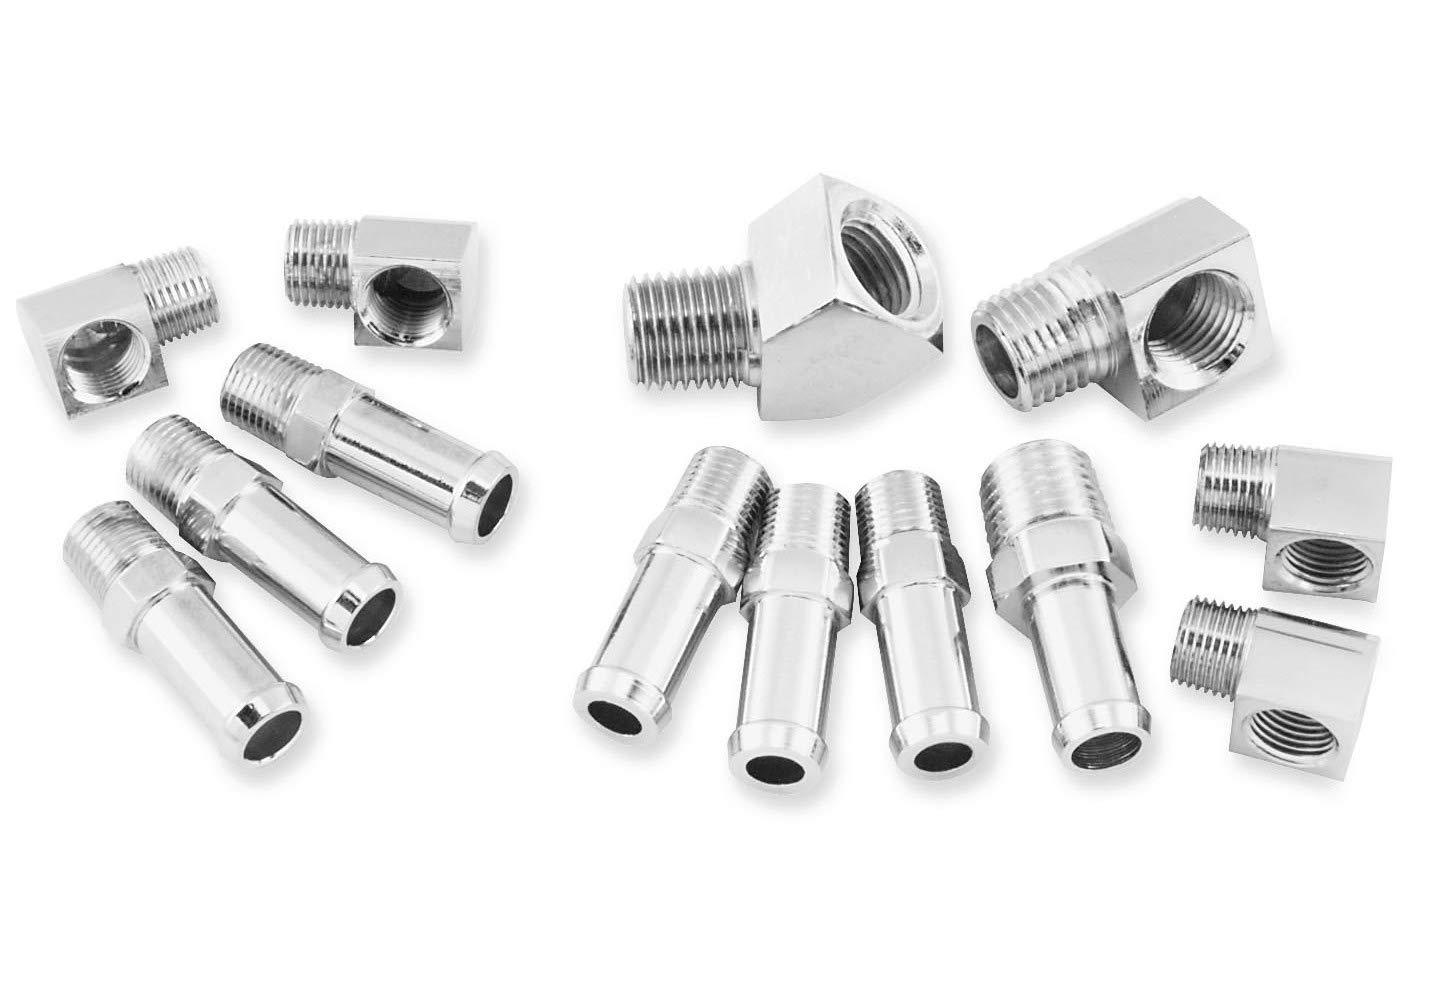 Gardner Westcott Oil Pump Fitting Kit C-31-167 TRTC13599 tr-041044